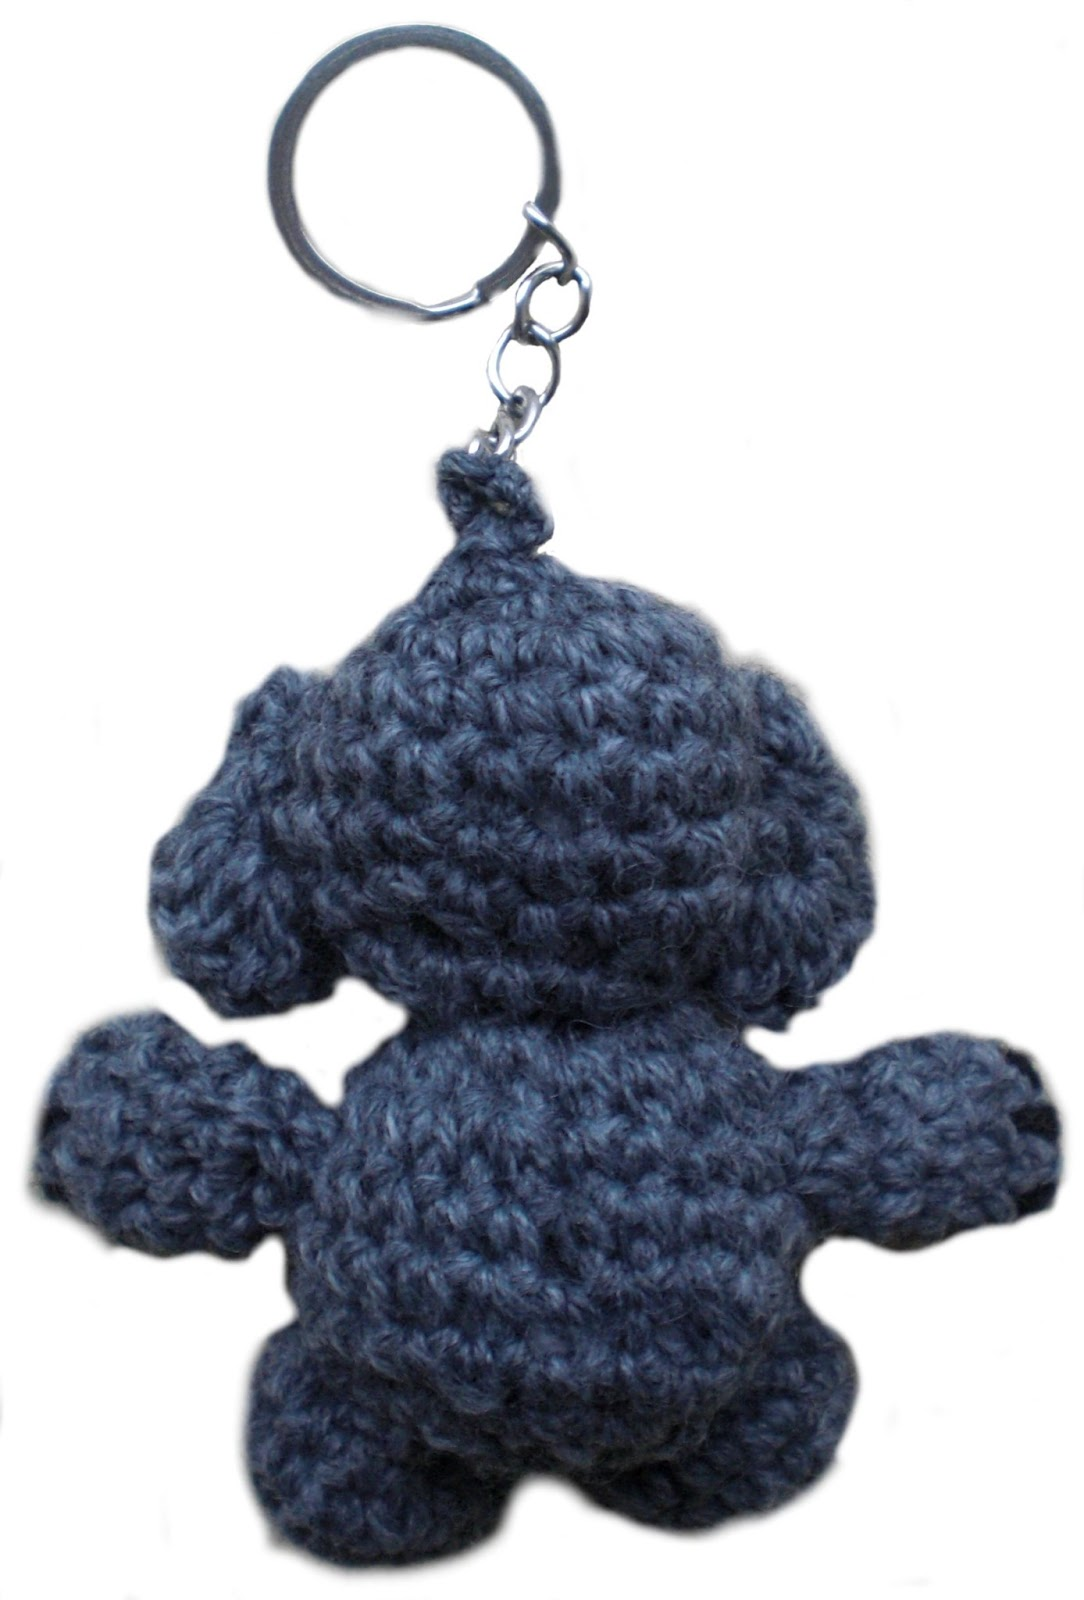 Llavero Koala Amigurumi : RODESIGN: LLAVERO KOALA